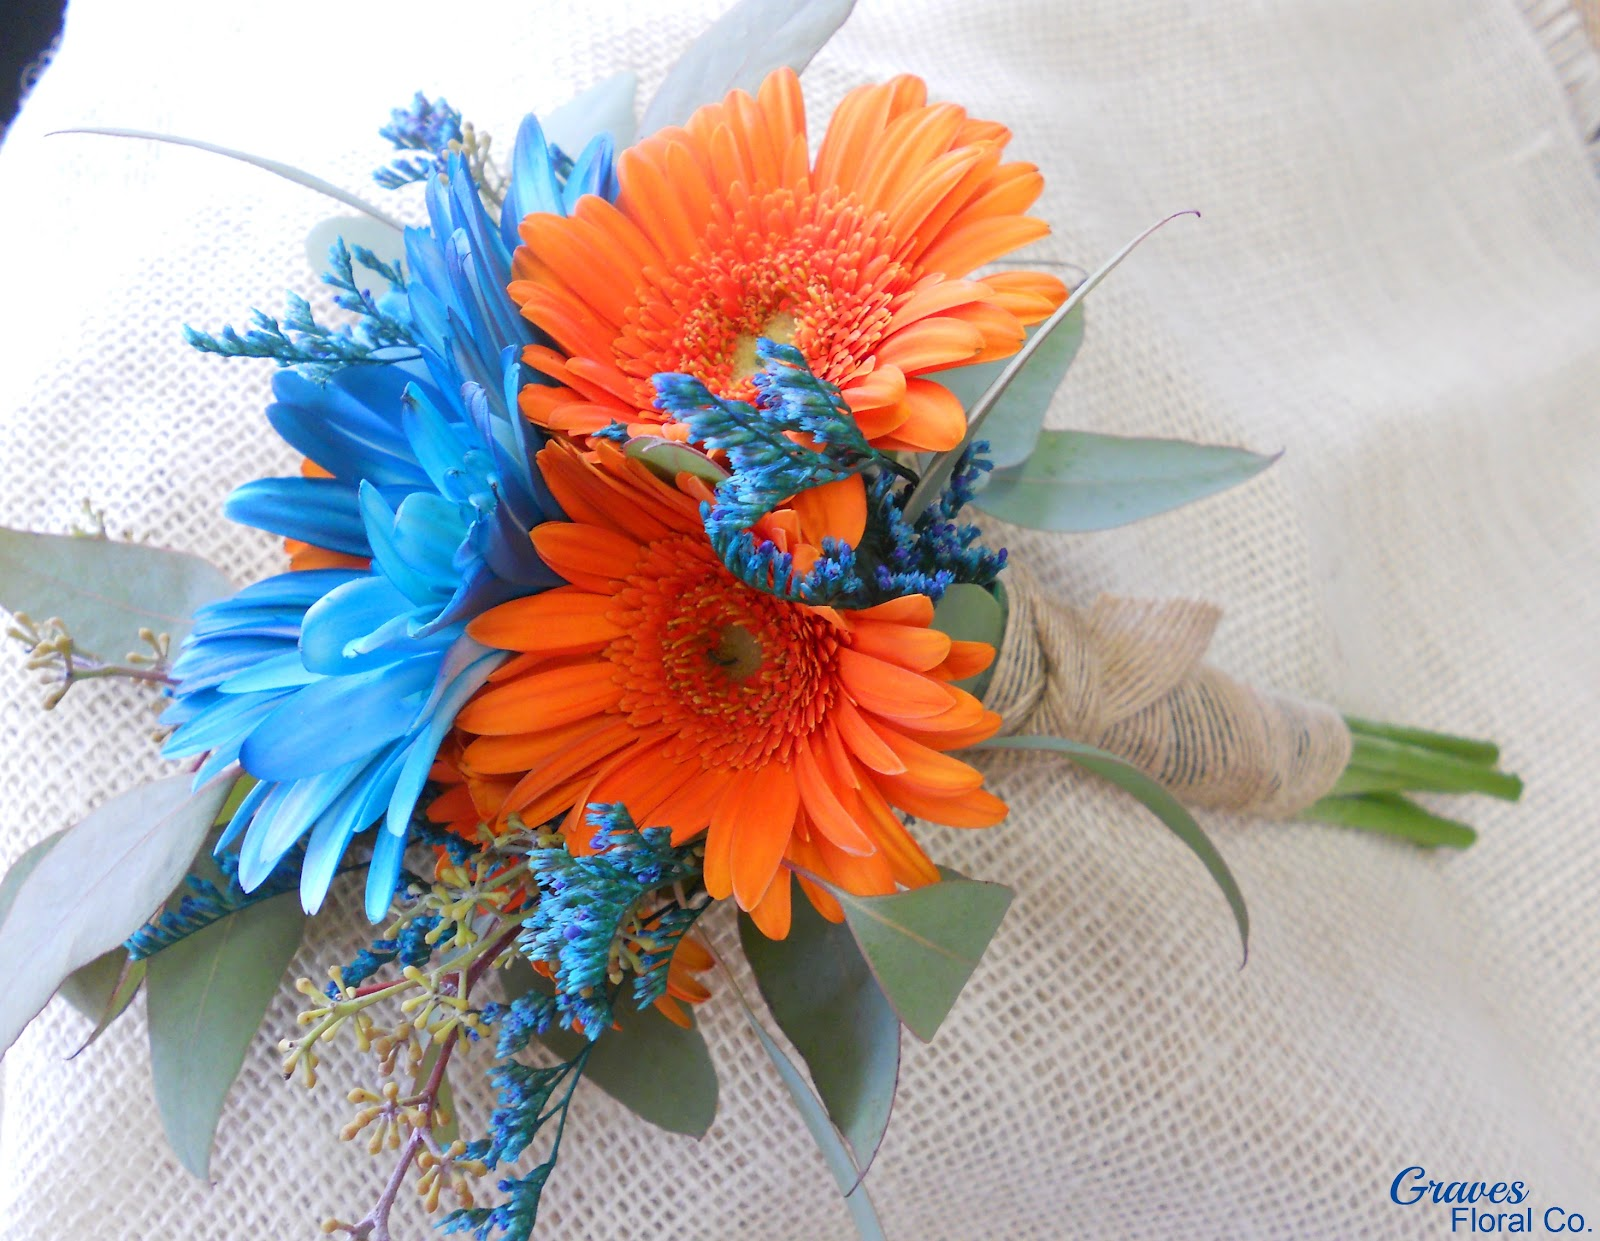 Graves Floral Co.: 2012 Weddings: Turquoise & Orange